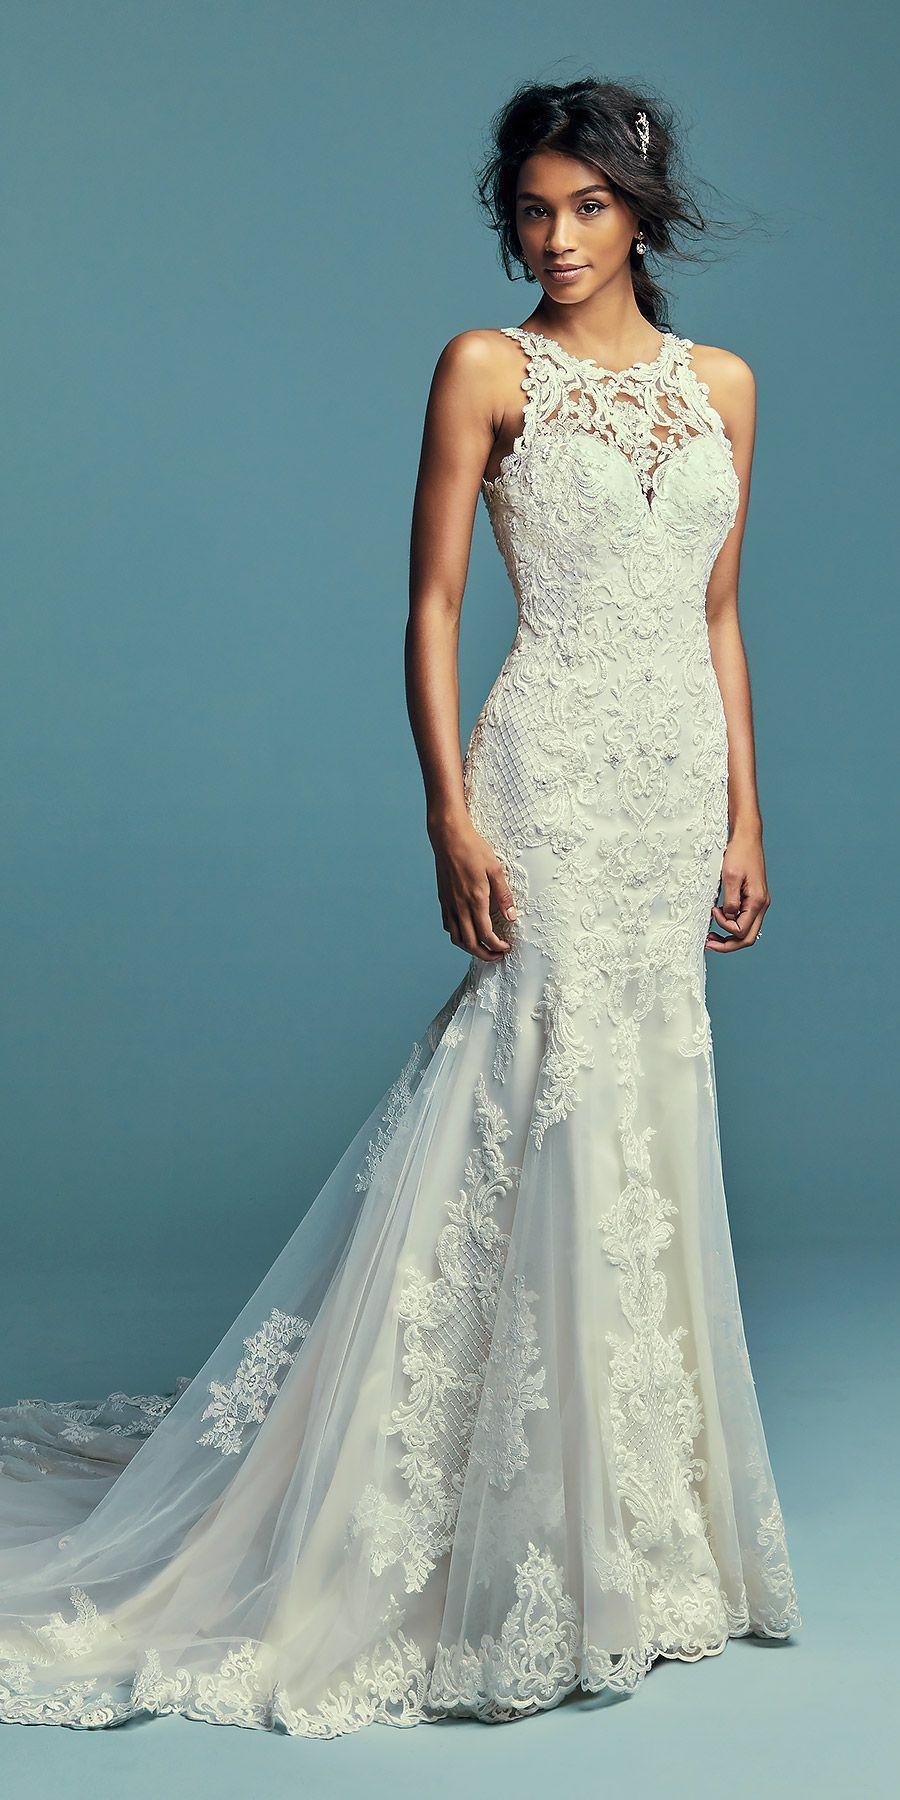 264da26d58  Ad Maggie Sottero wedding dress KENDALL. Classic yet striking